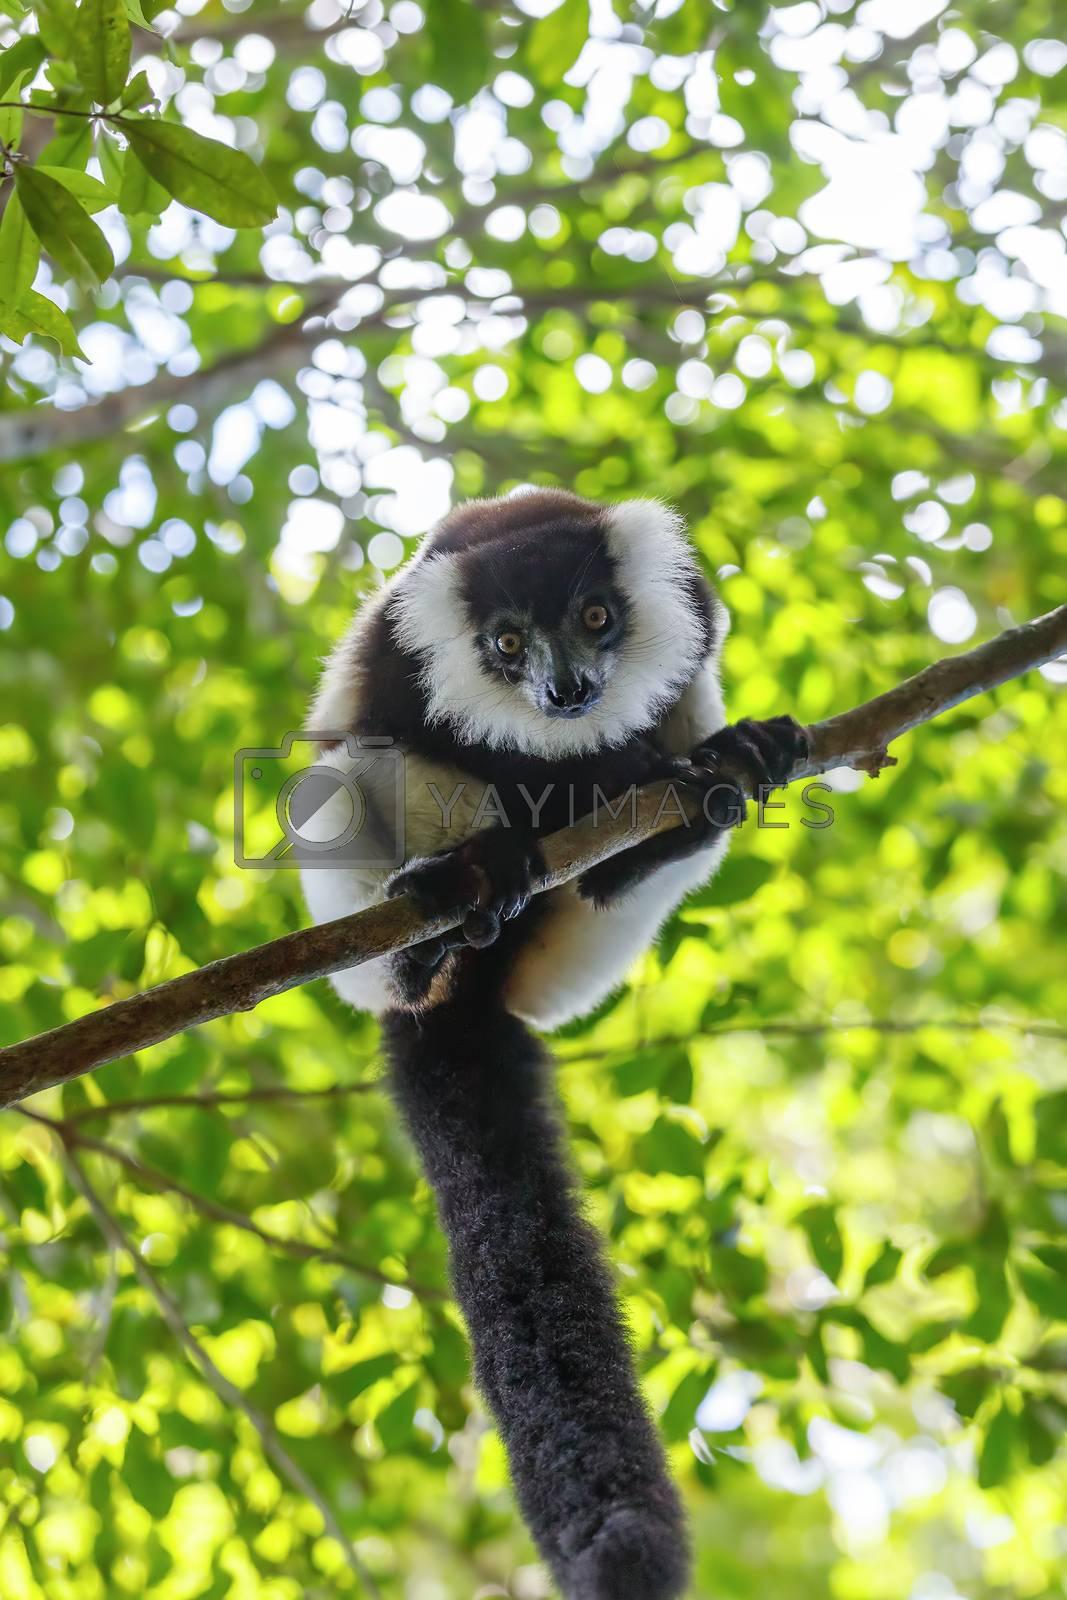 Black-and-white ruffed lemur (Varecia variegata subcincta) in natural rainforest habitat, Nosy Mangabe forest reserve. Madagascar wildlife and wilderness